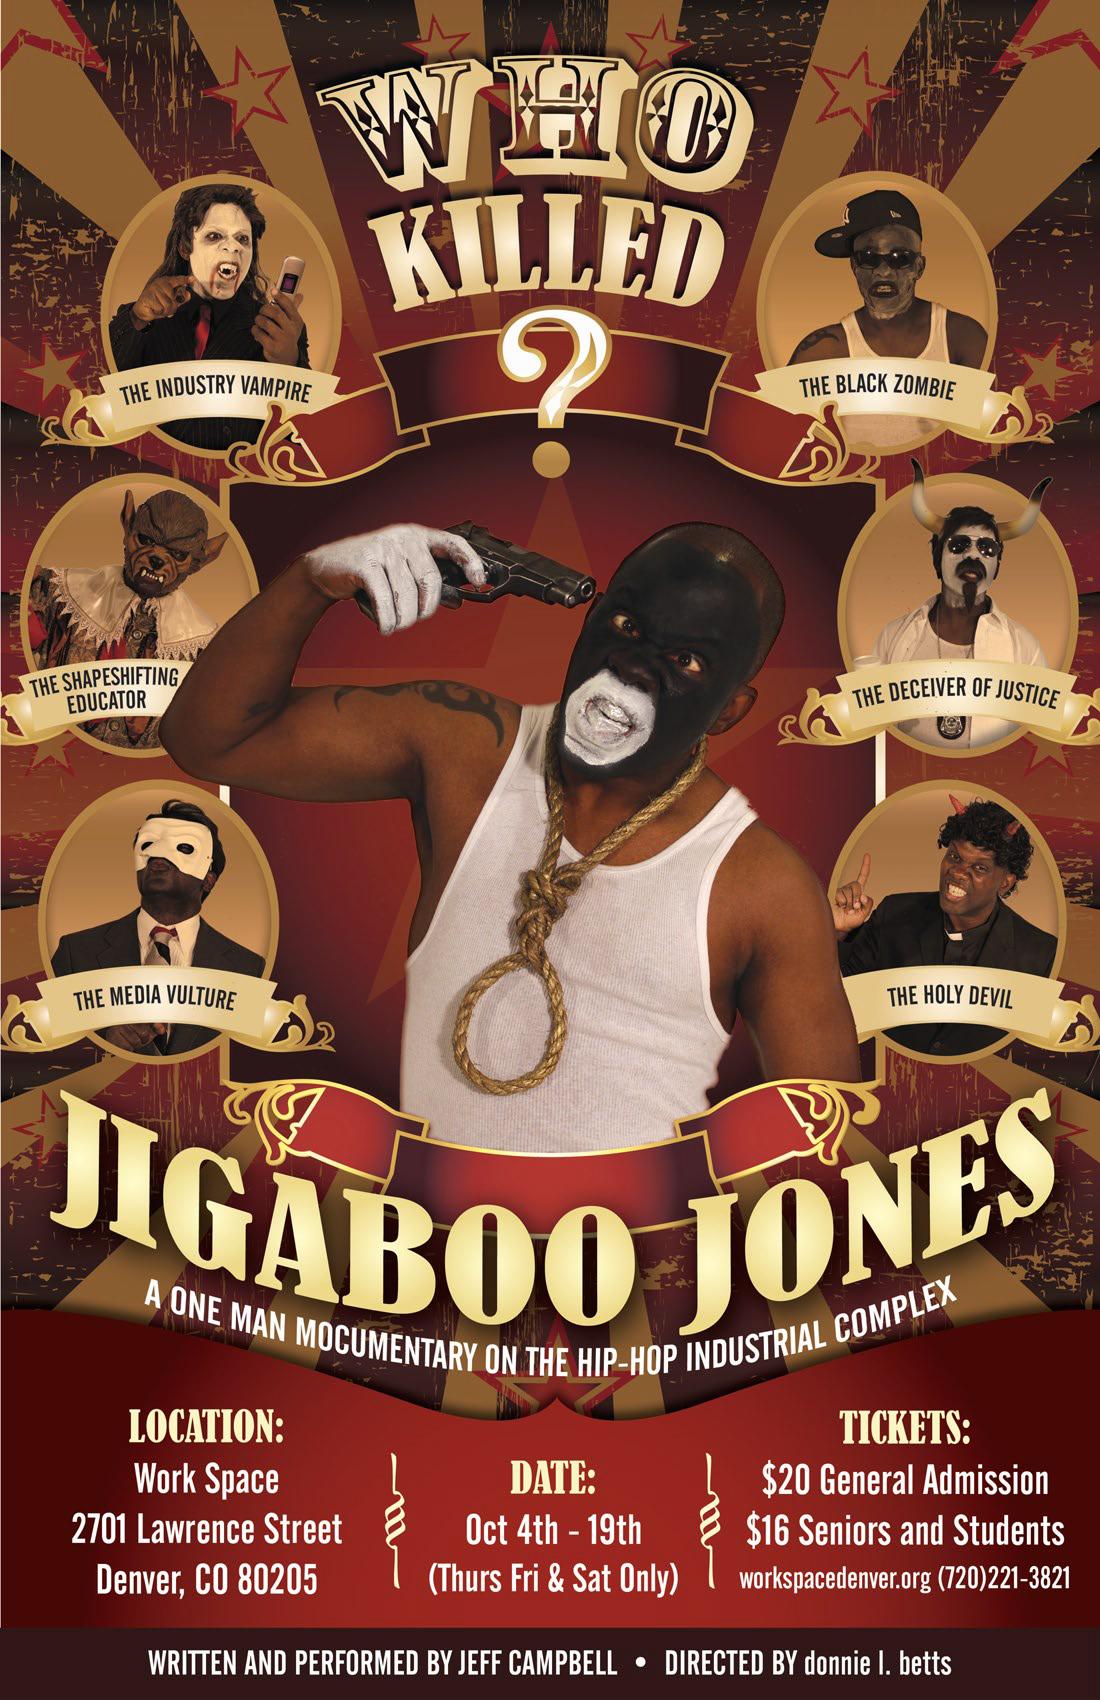 Who Killed Jigaboo Jones